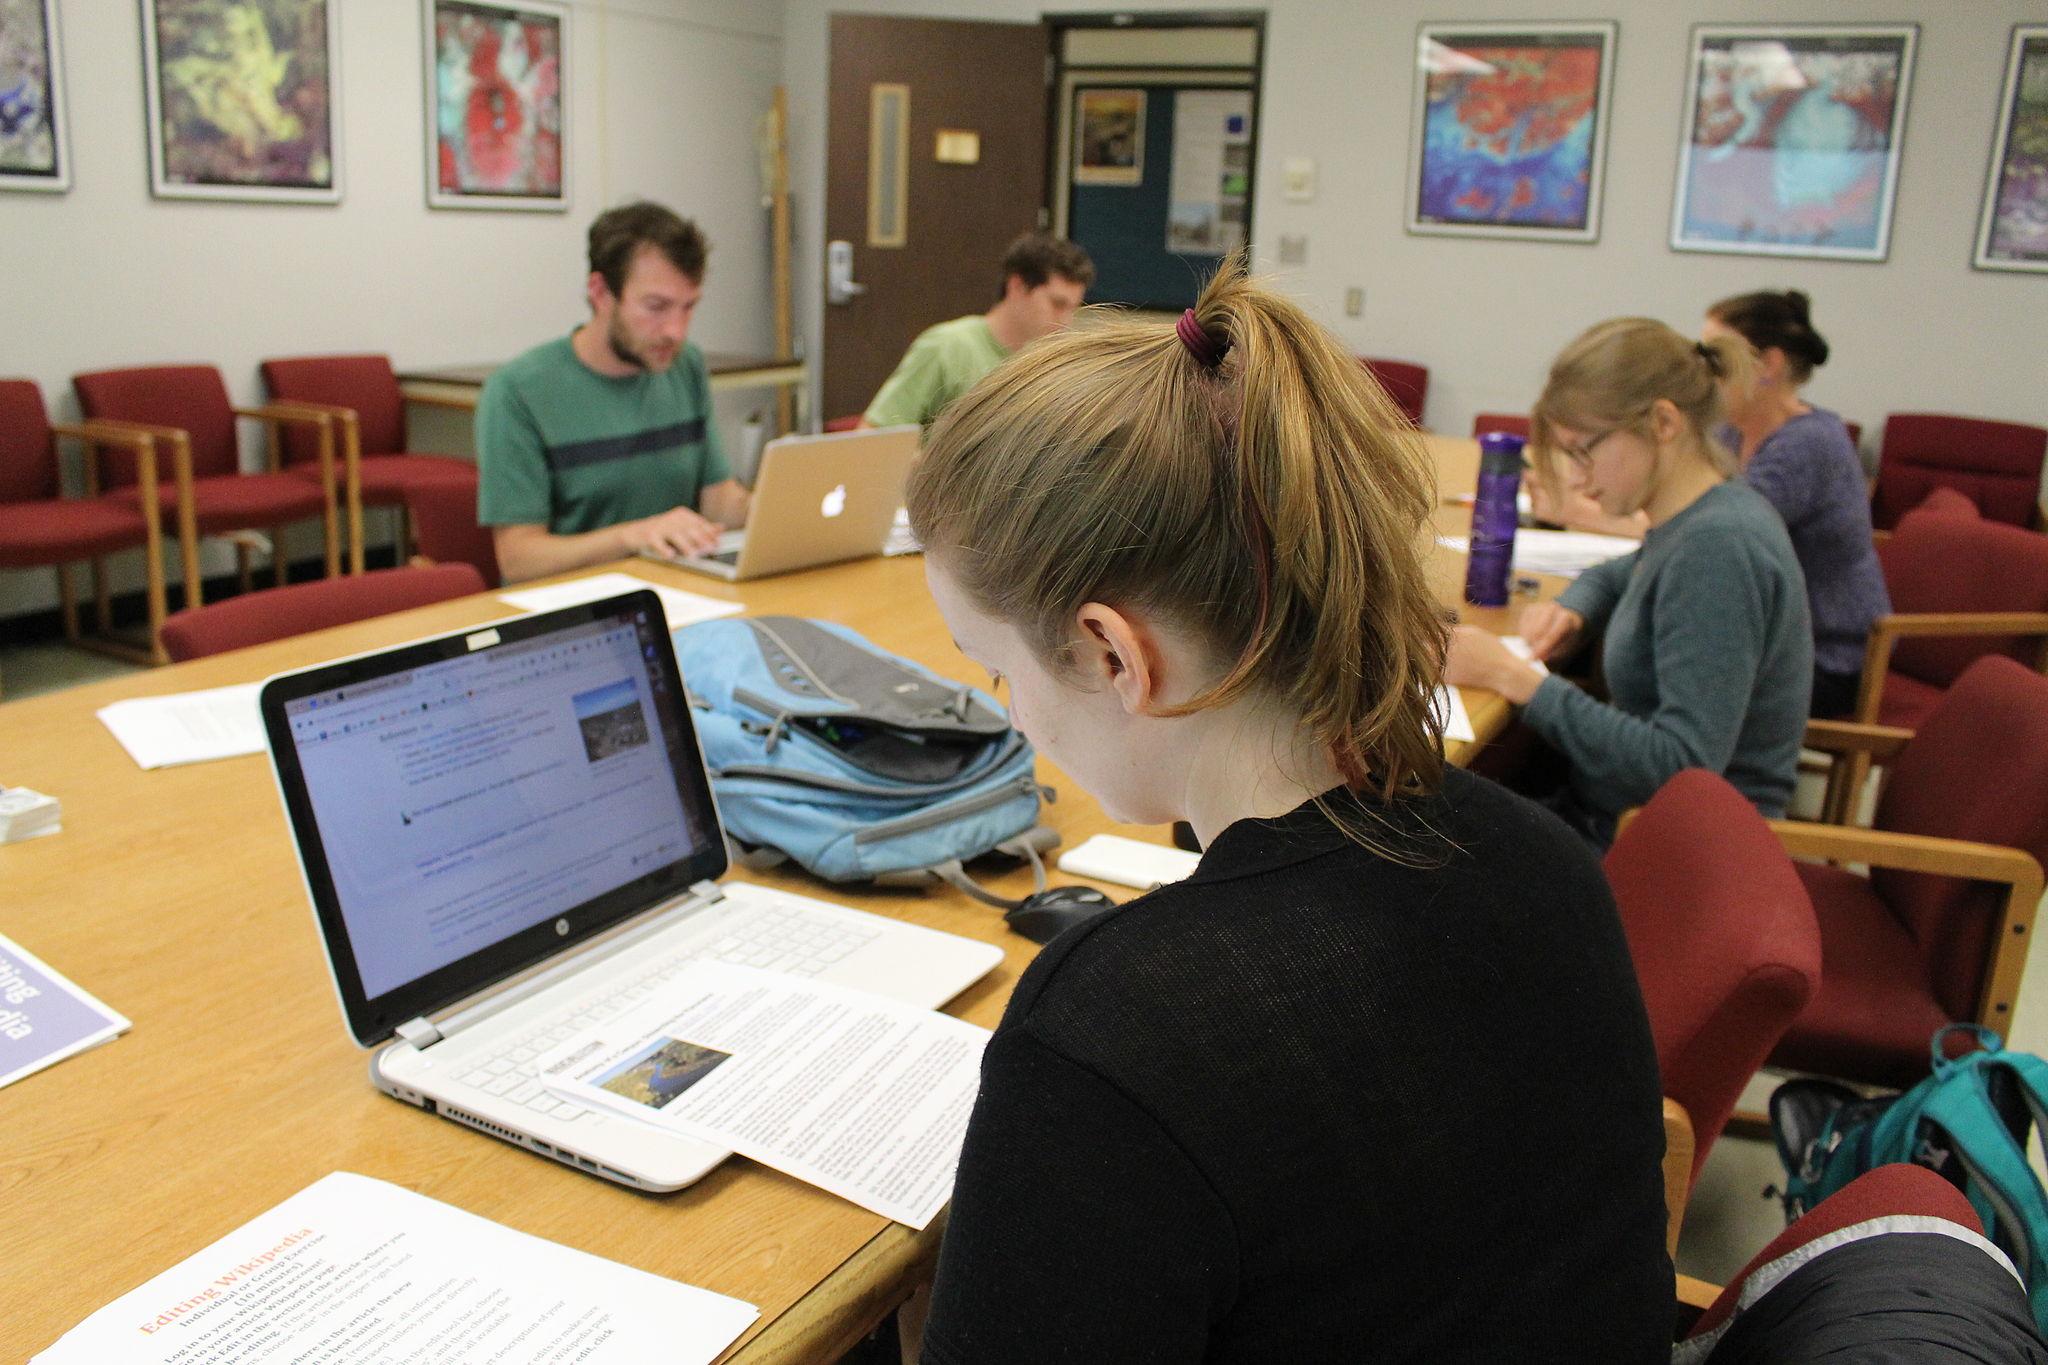 OSU Hyrdophiles students edit Wikipedia